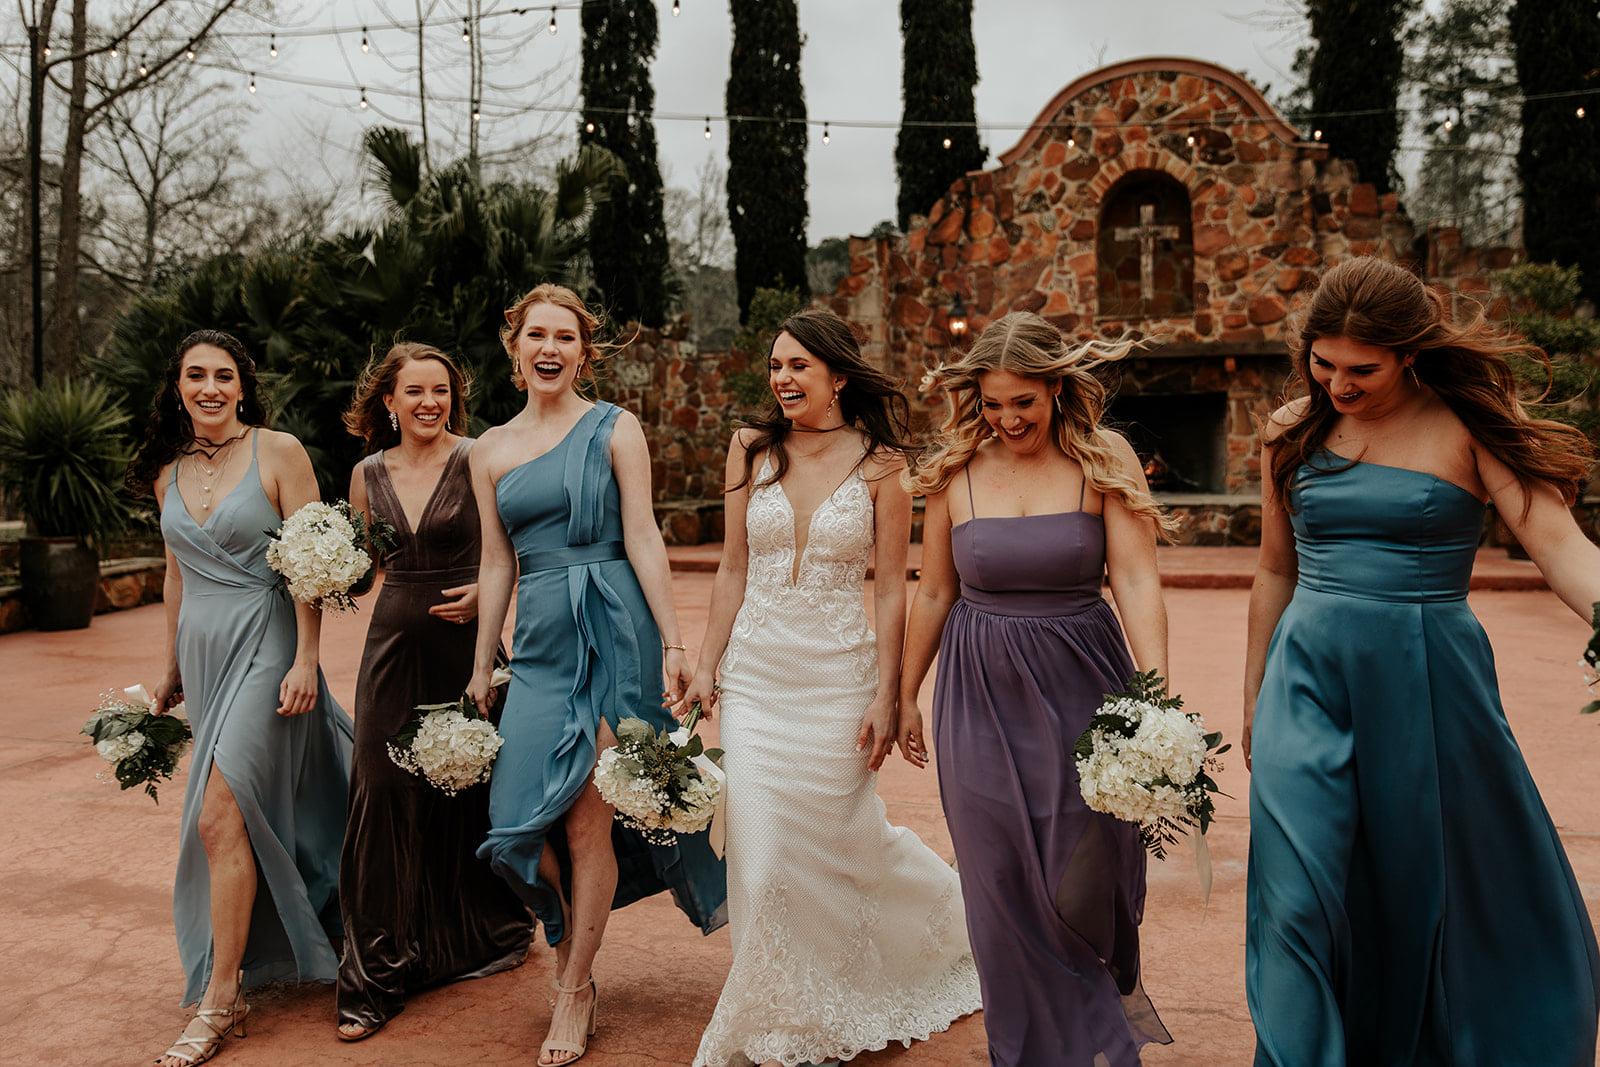 Mix & Match Bridesmaids Dress